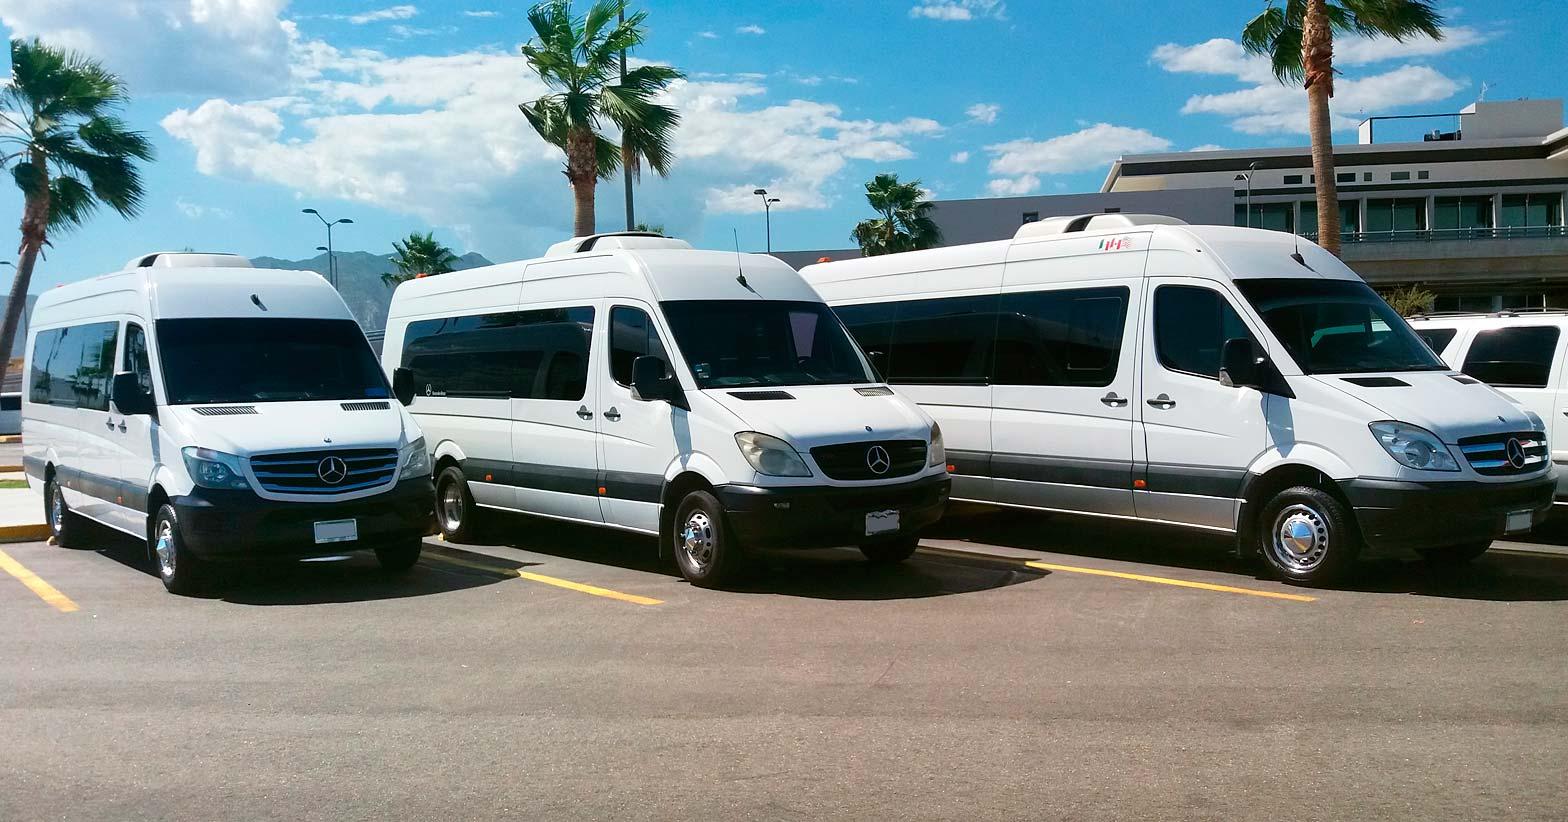 Sprinters - Airport Shuttle Transportation - Los Cabos, Cabo San Lucas, San Jose del Cabo